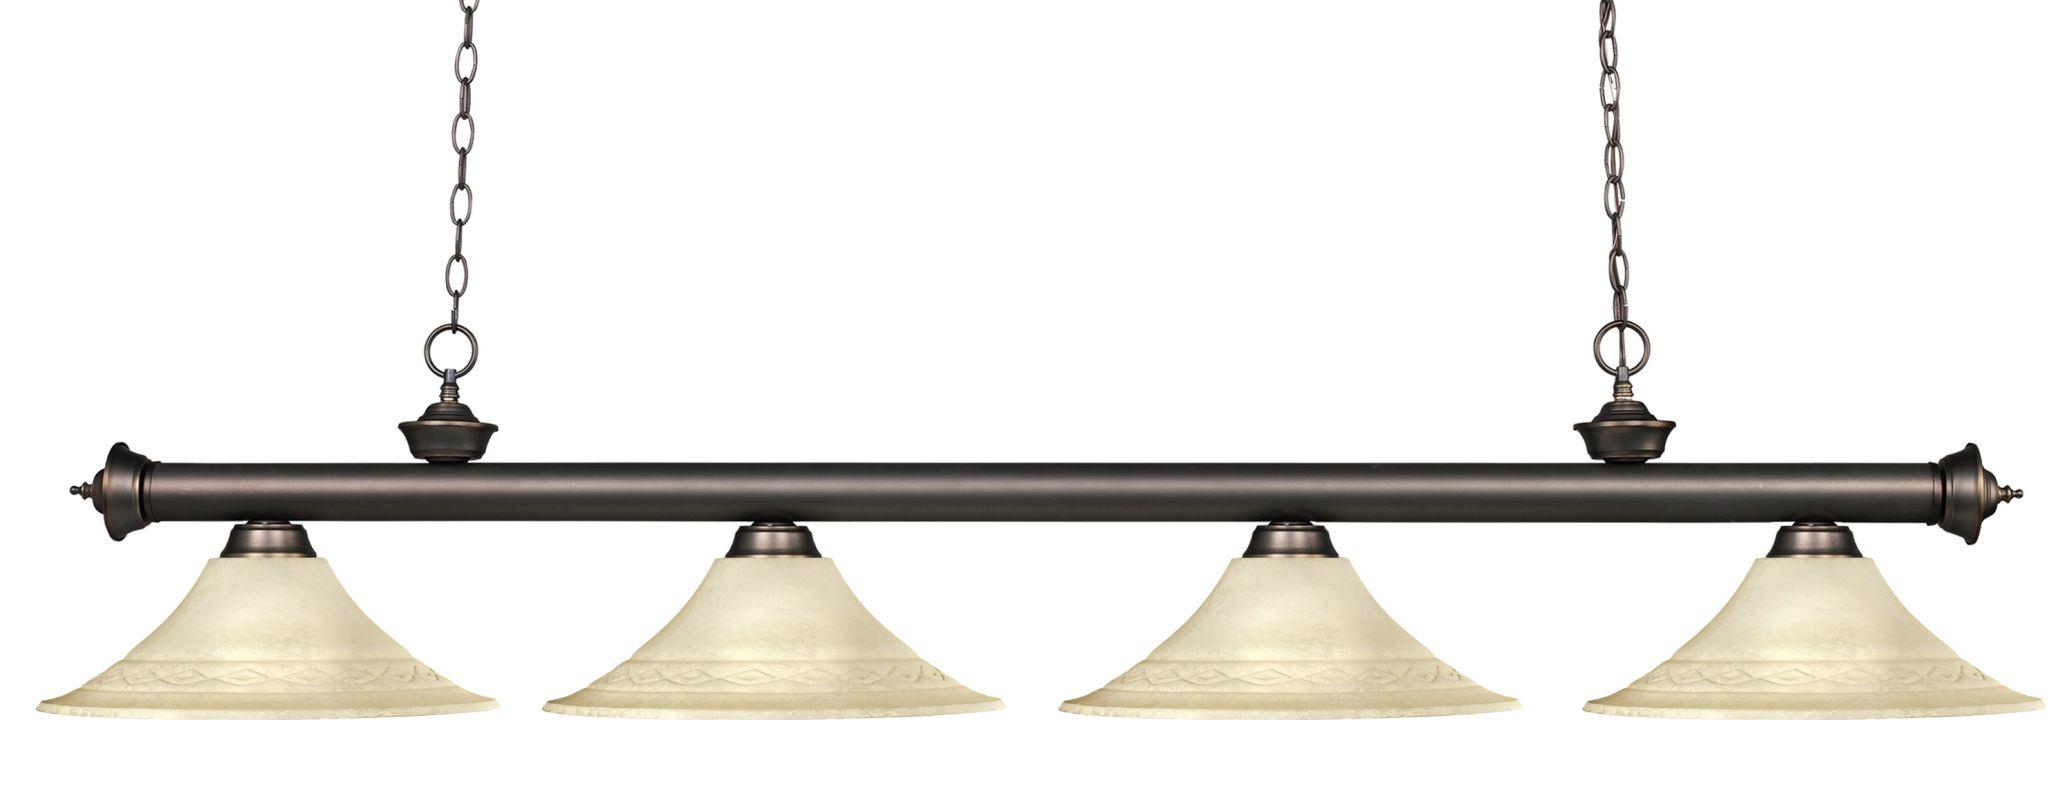 Z-Lite 200-4-FGM16 Riviera 4 Light Island/Billiard Light with Fluted